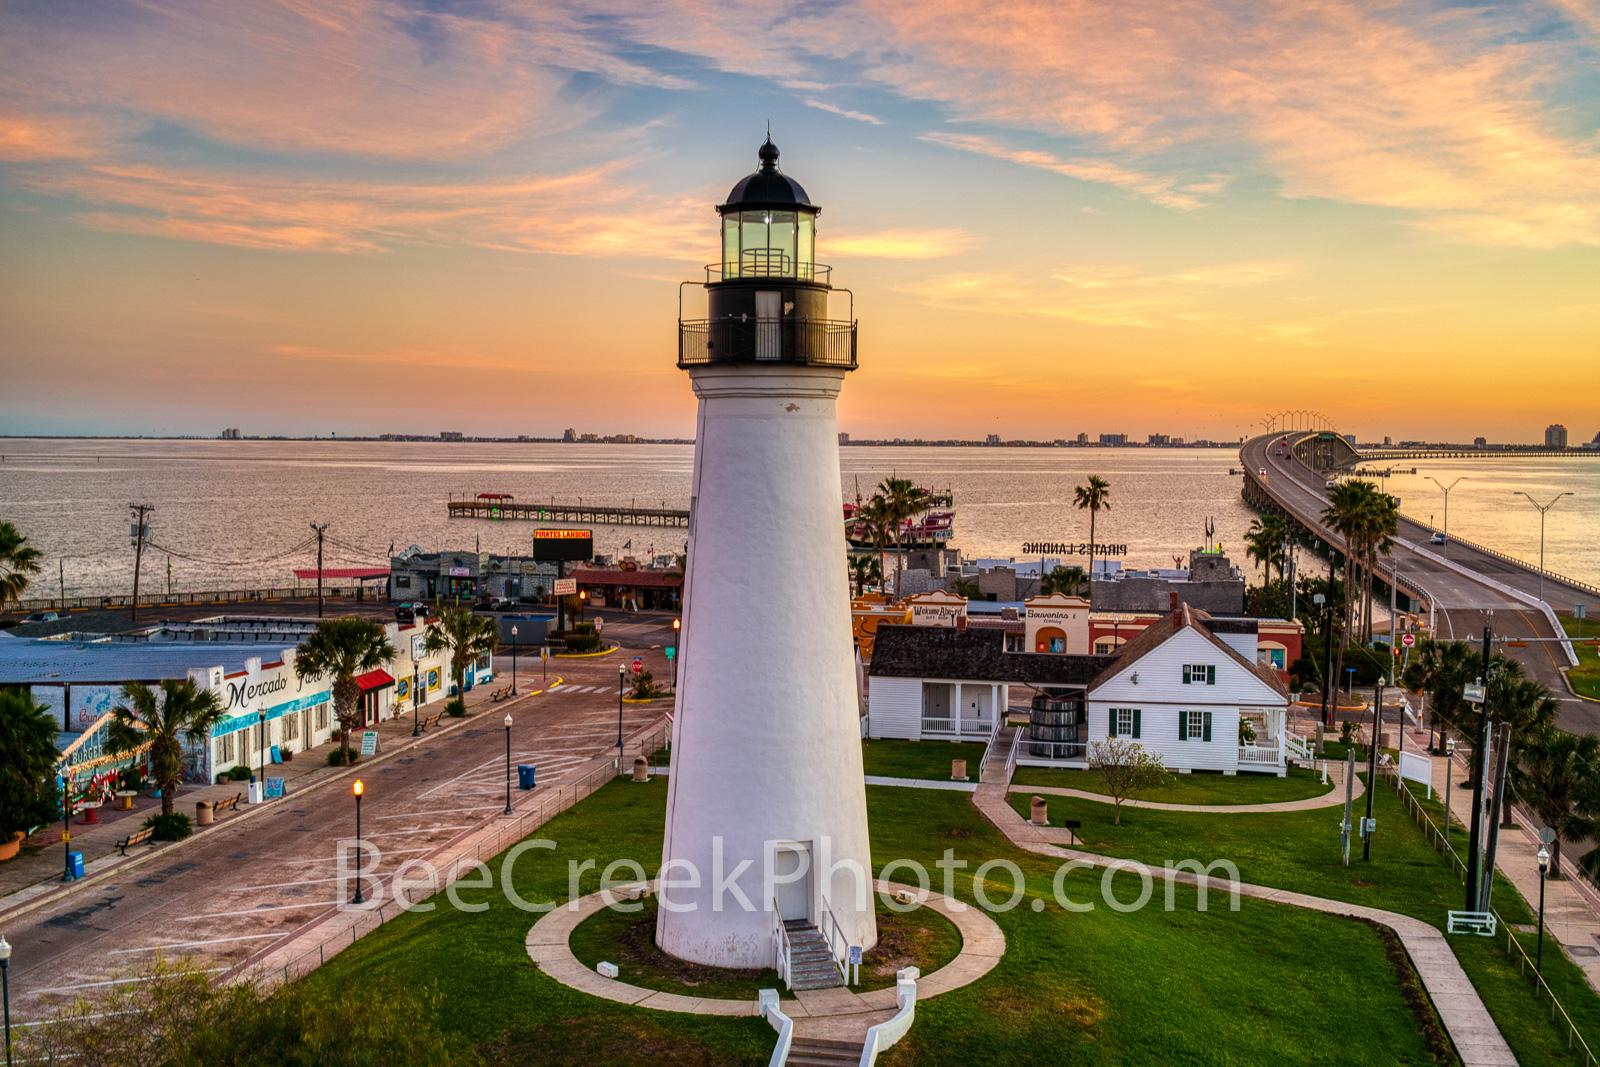 Port Isabel Lighthouse, sunrise, port isabel, landmark, historic, city, lighthouse keepers cottage, coastal, south padre island, beach, coast, queen isabela causeway, bridge, valley, south texas,